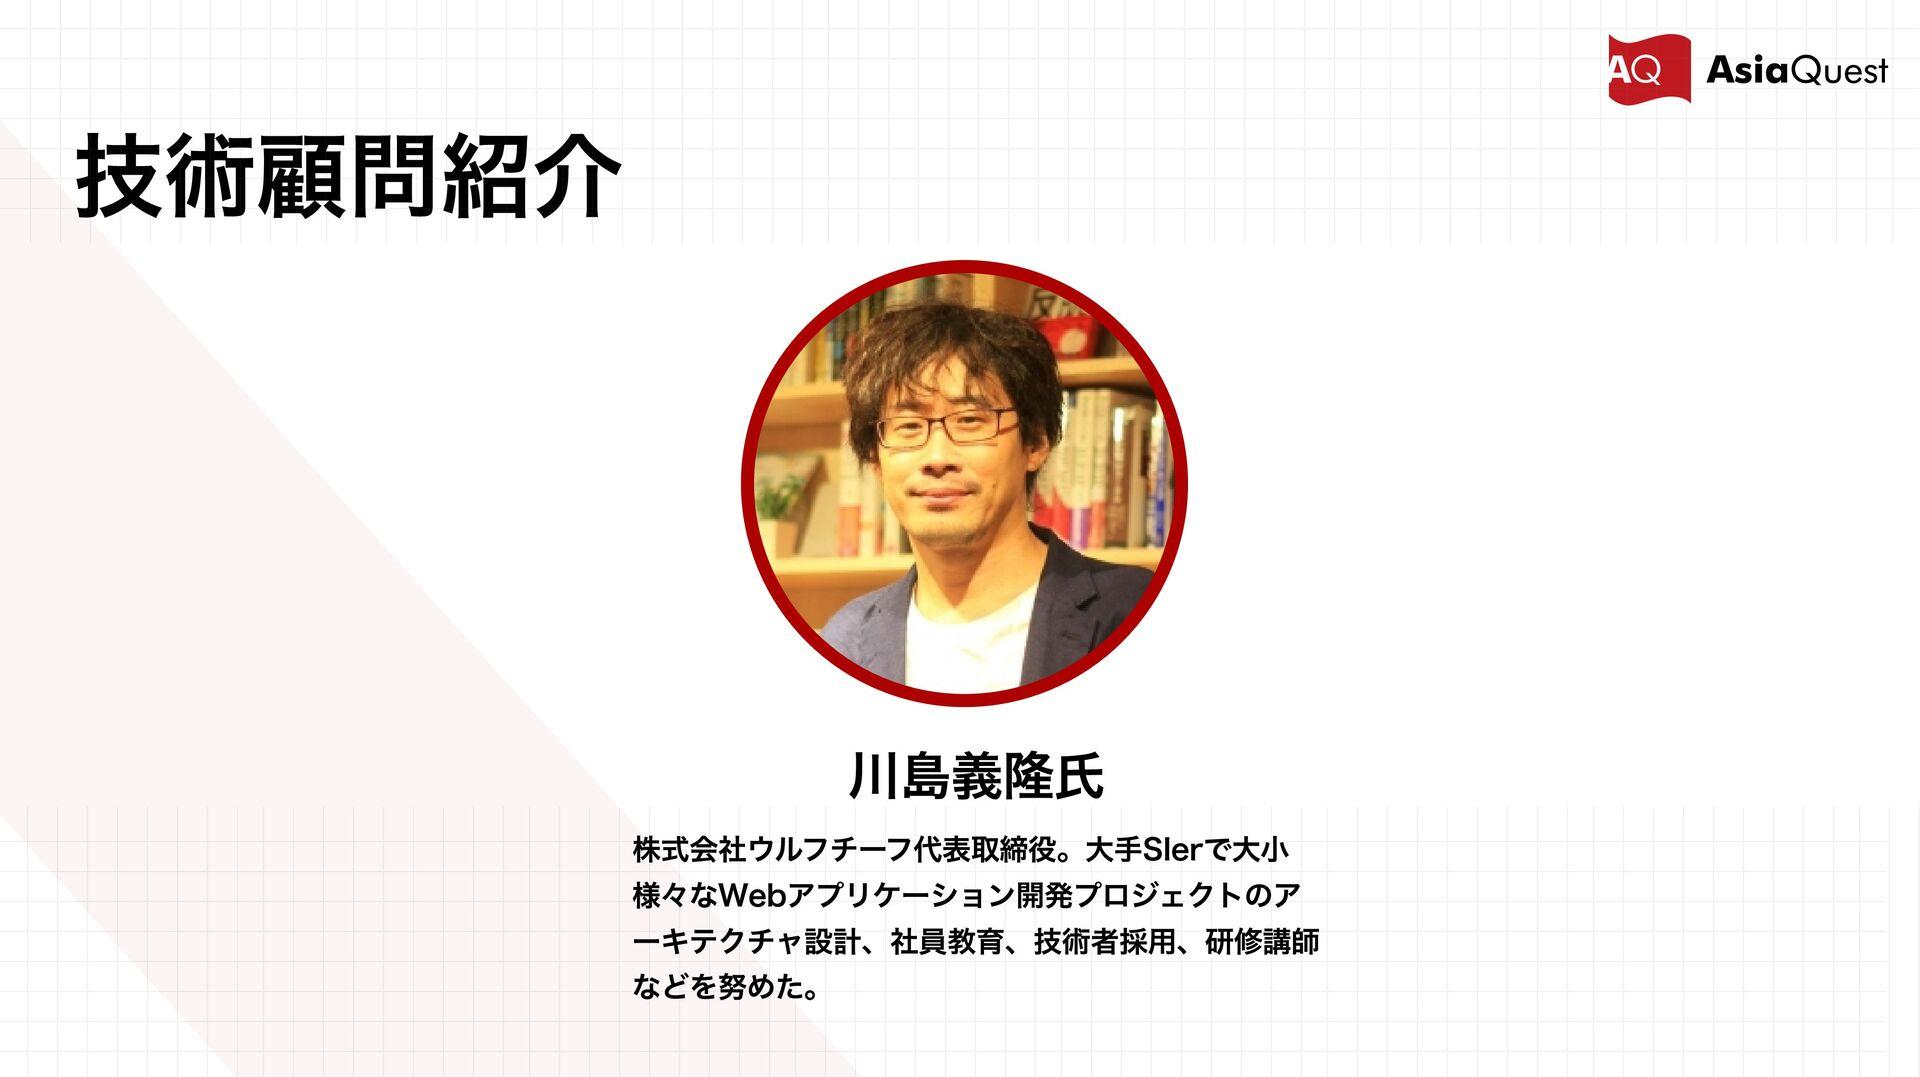 You! We Invite エントリーお待ちしています!! アジアクエスト 採⽤ 検索